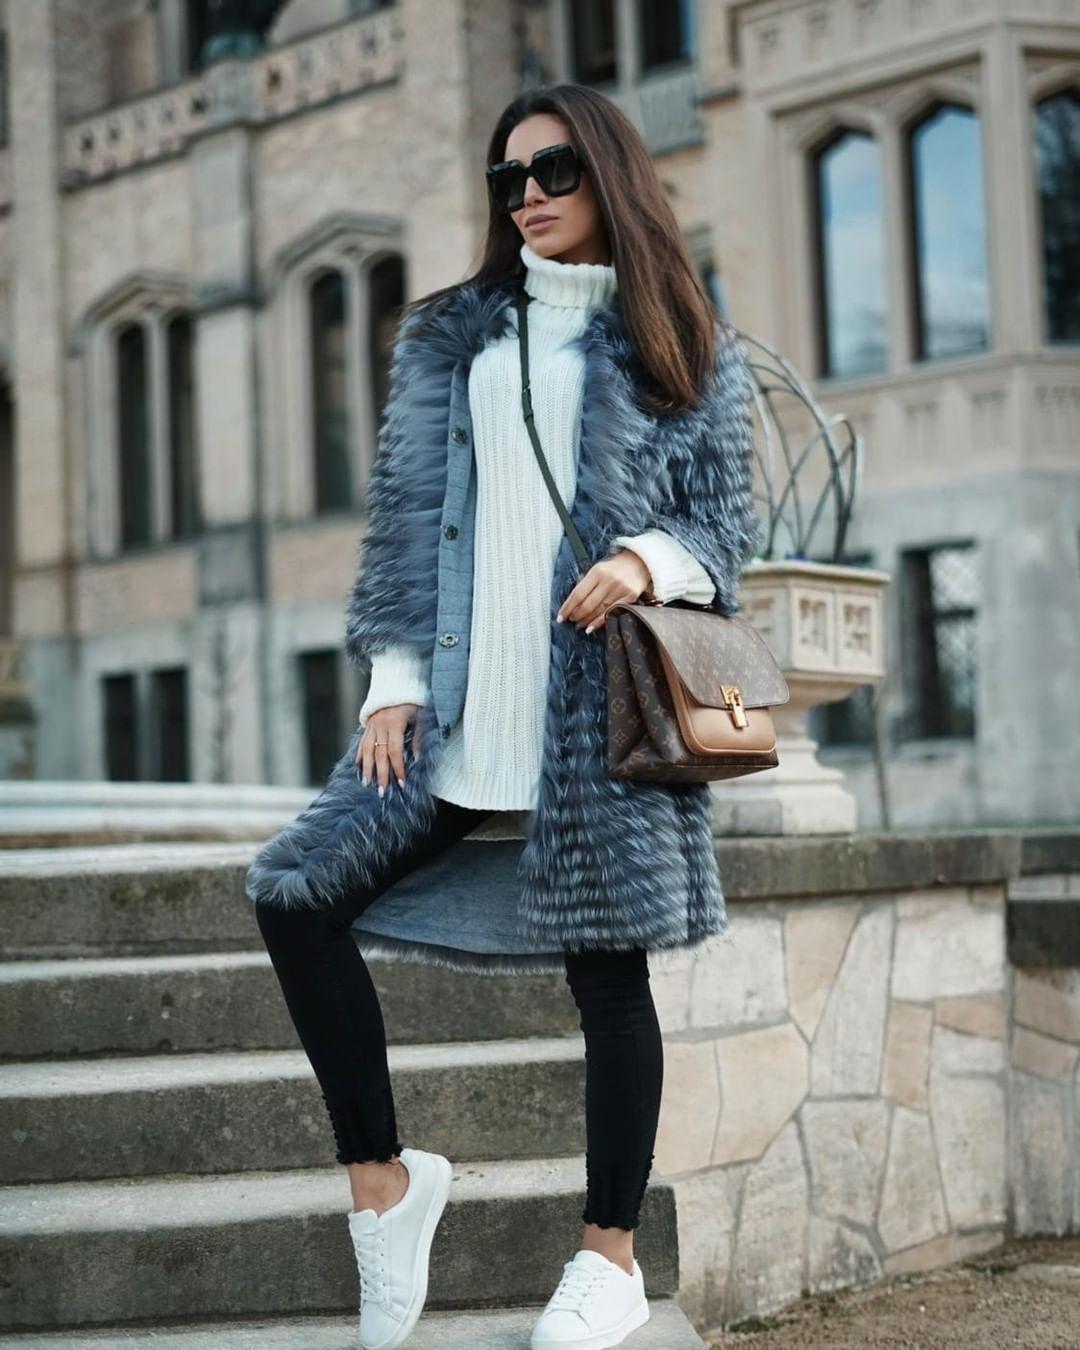 felice-gray-veronika_klimovits-1